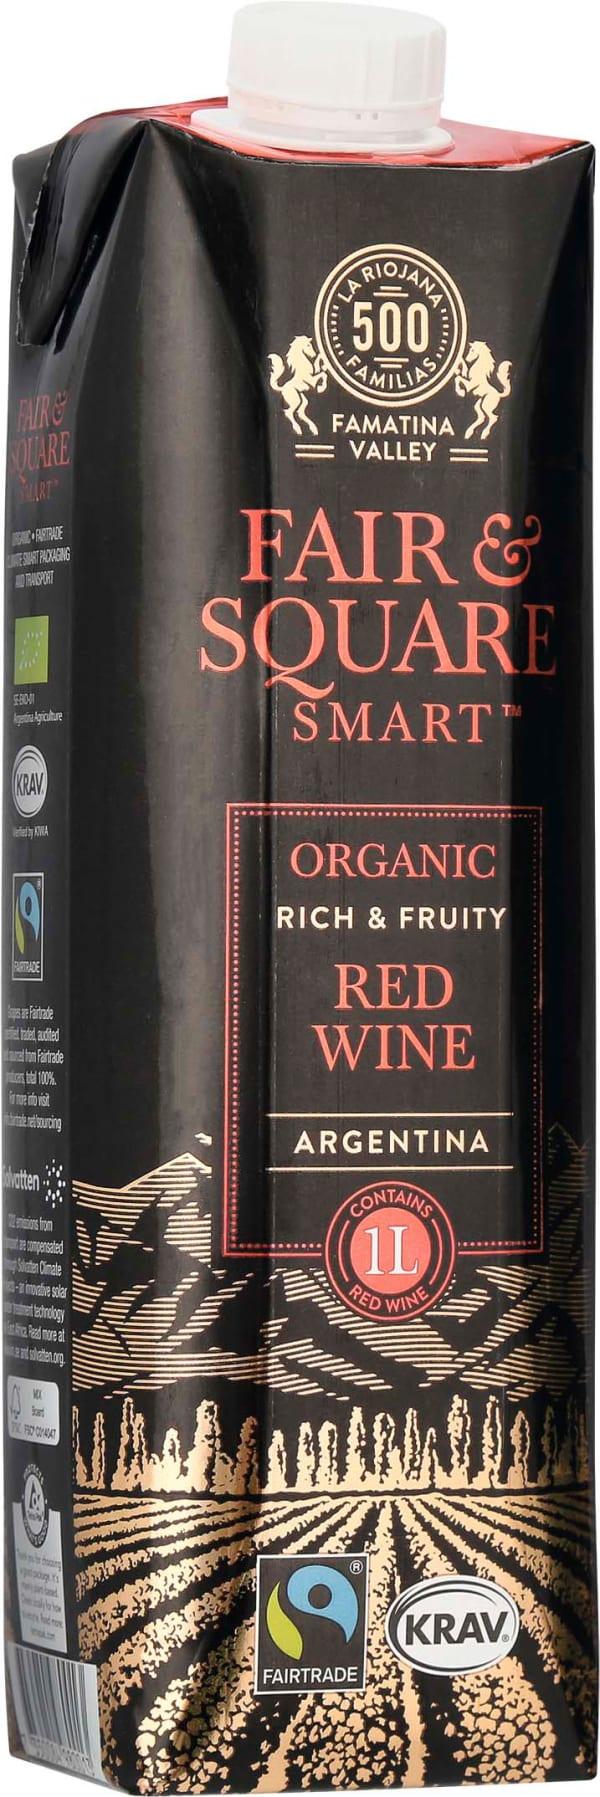 Fair & Square Red 2018 kartongförpackning